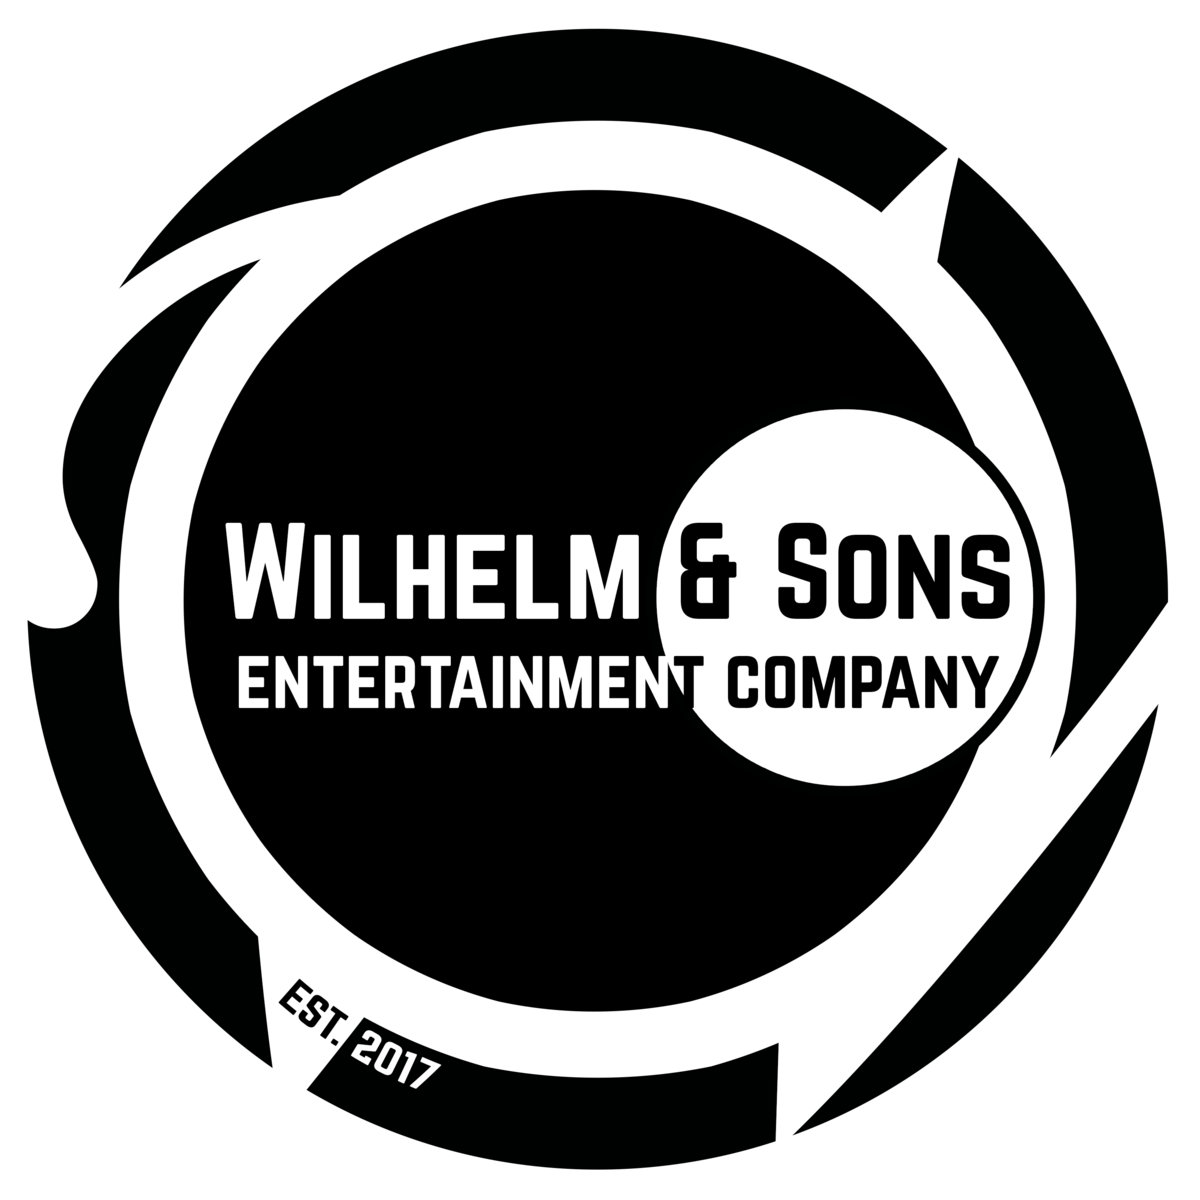 Wilhelm & Sons Entertainment Company